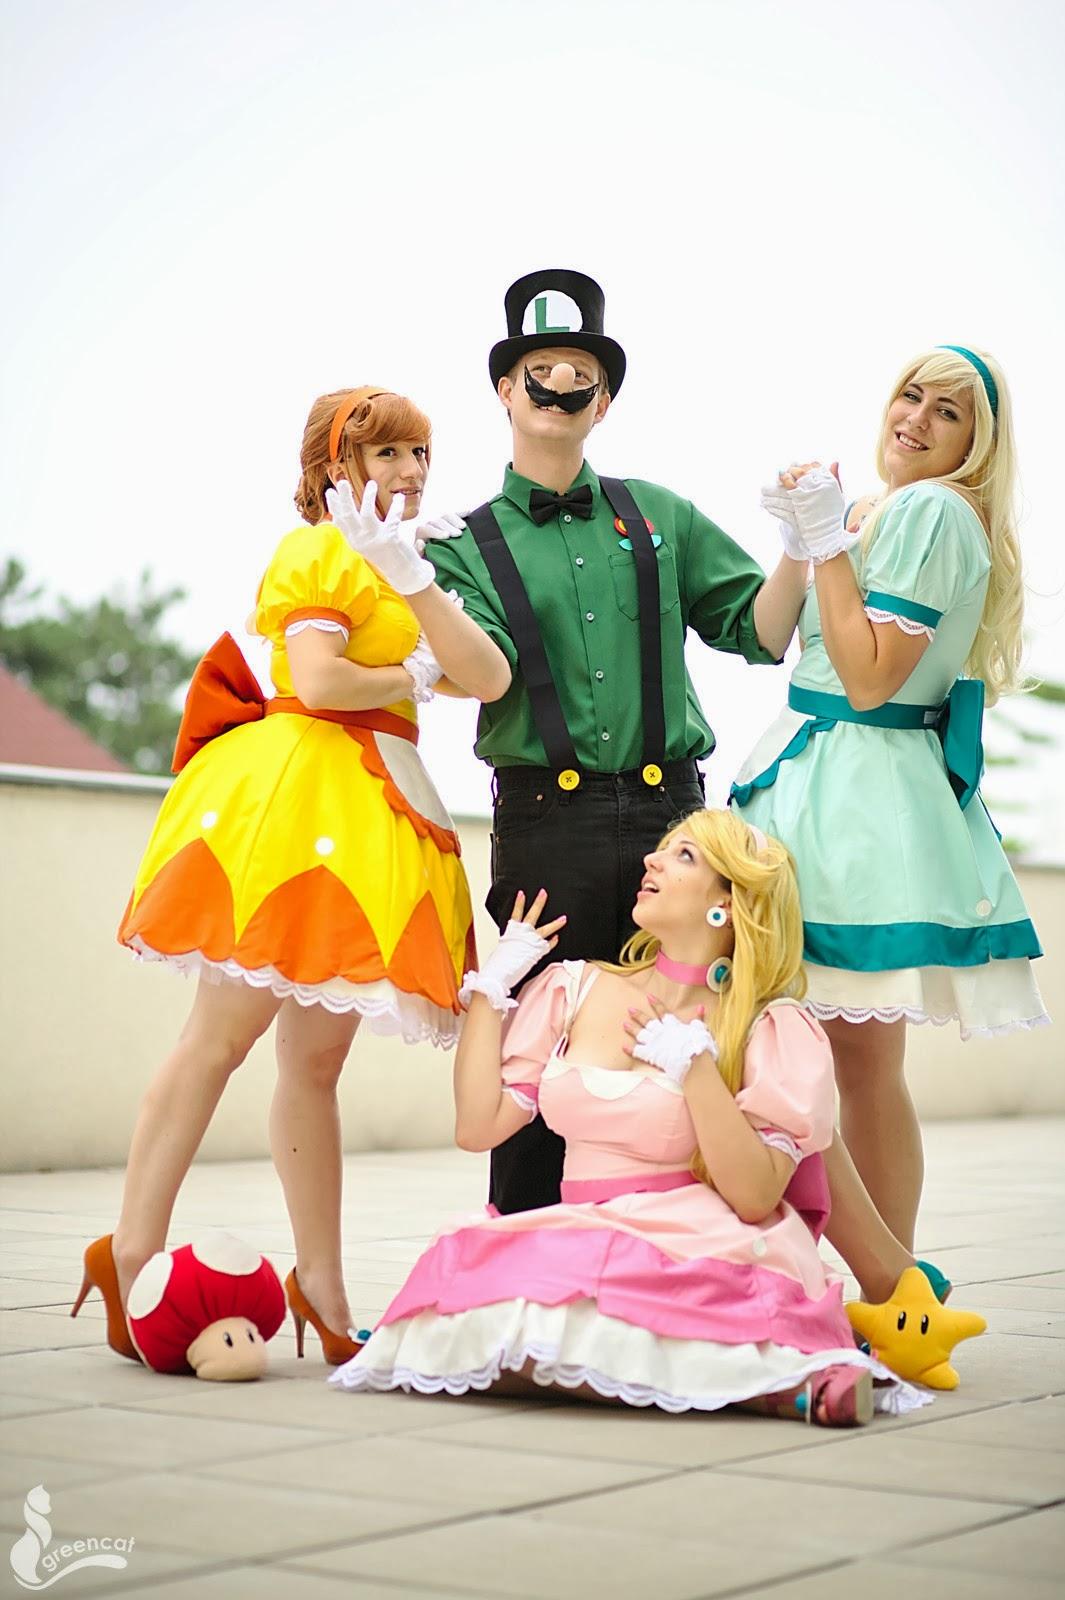 luigi-mario-cosplay-peach